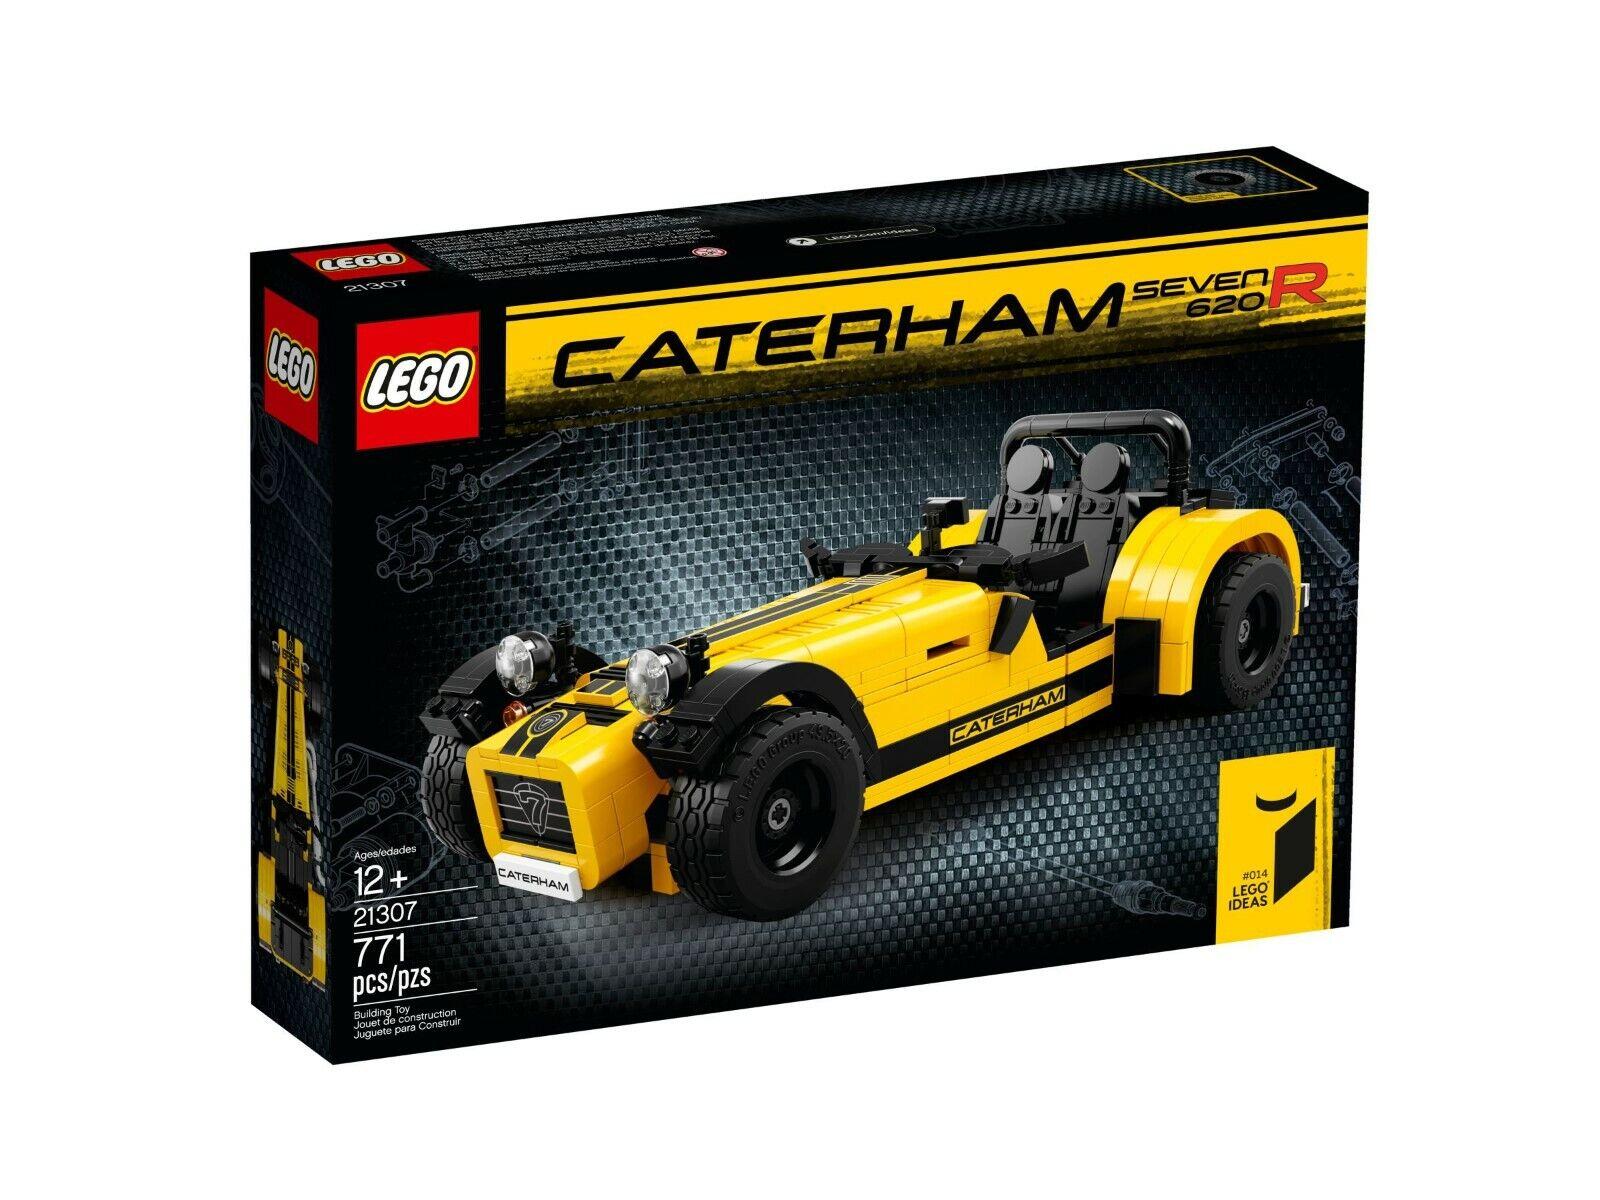 LEGO ® Ideas 21307 Caterham Seven 620r-NEUF & neuf dans sa boîte -